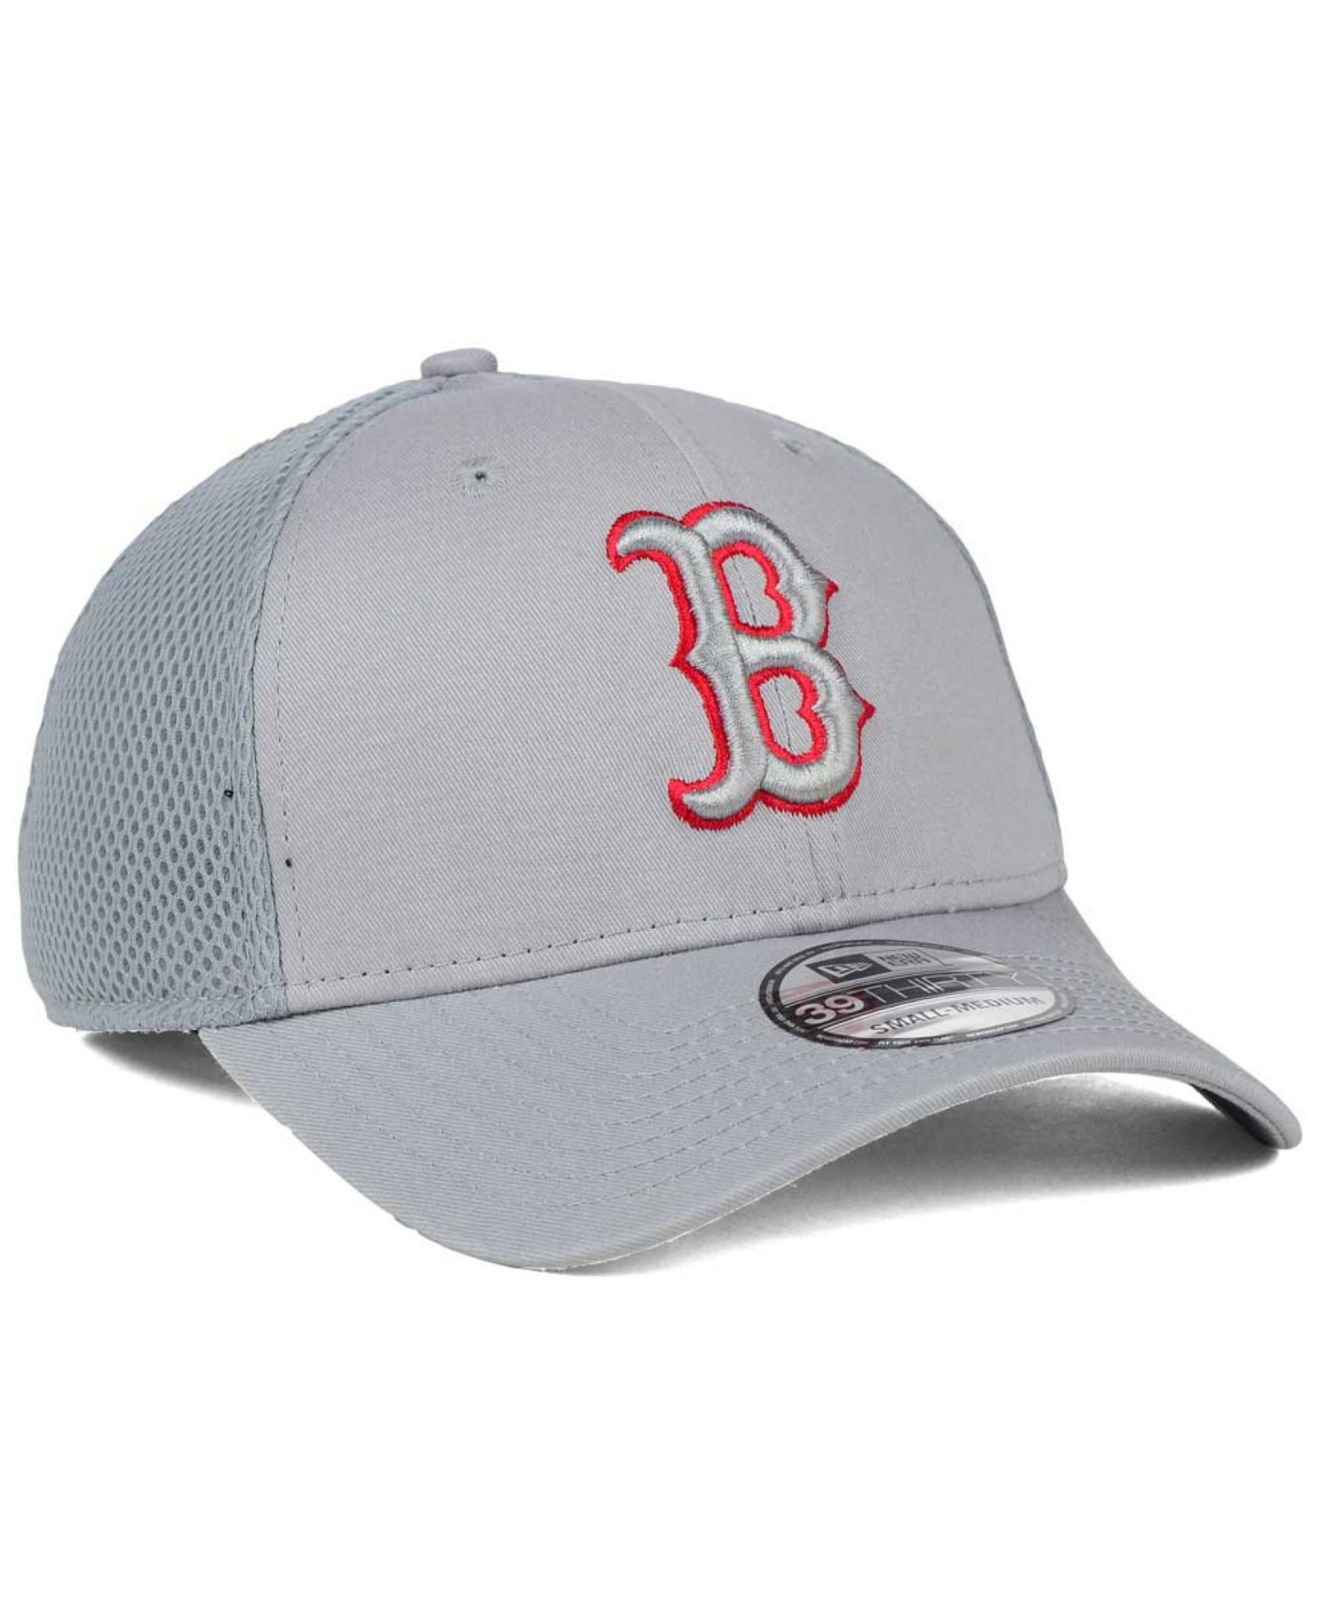 online retailer 10ecc 6122b KTZ Boston Red Sox Grey Neo 39thirty Cap in Gray for Men - Lyst